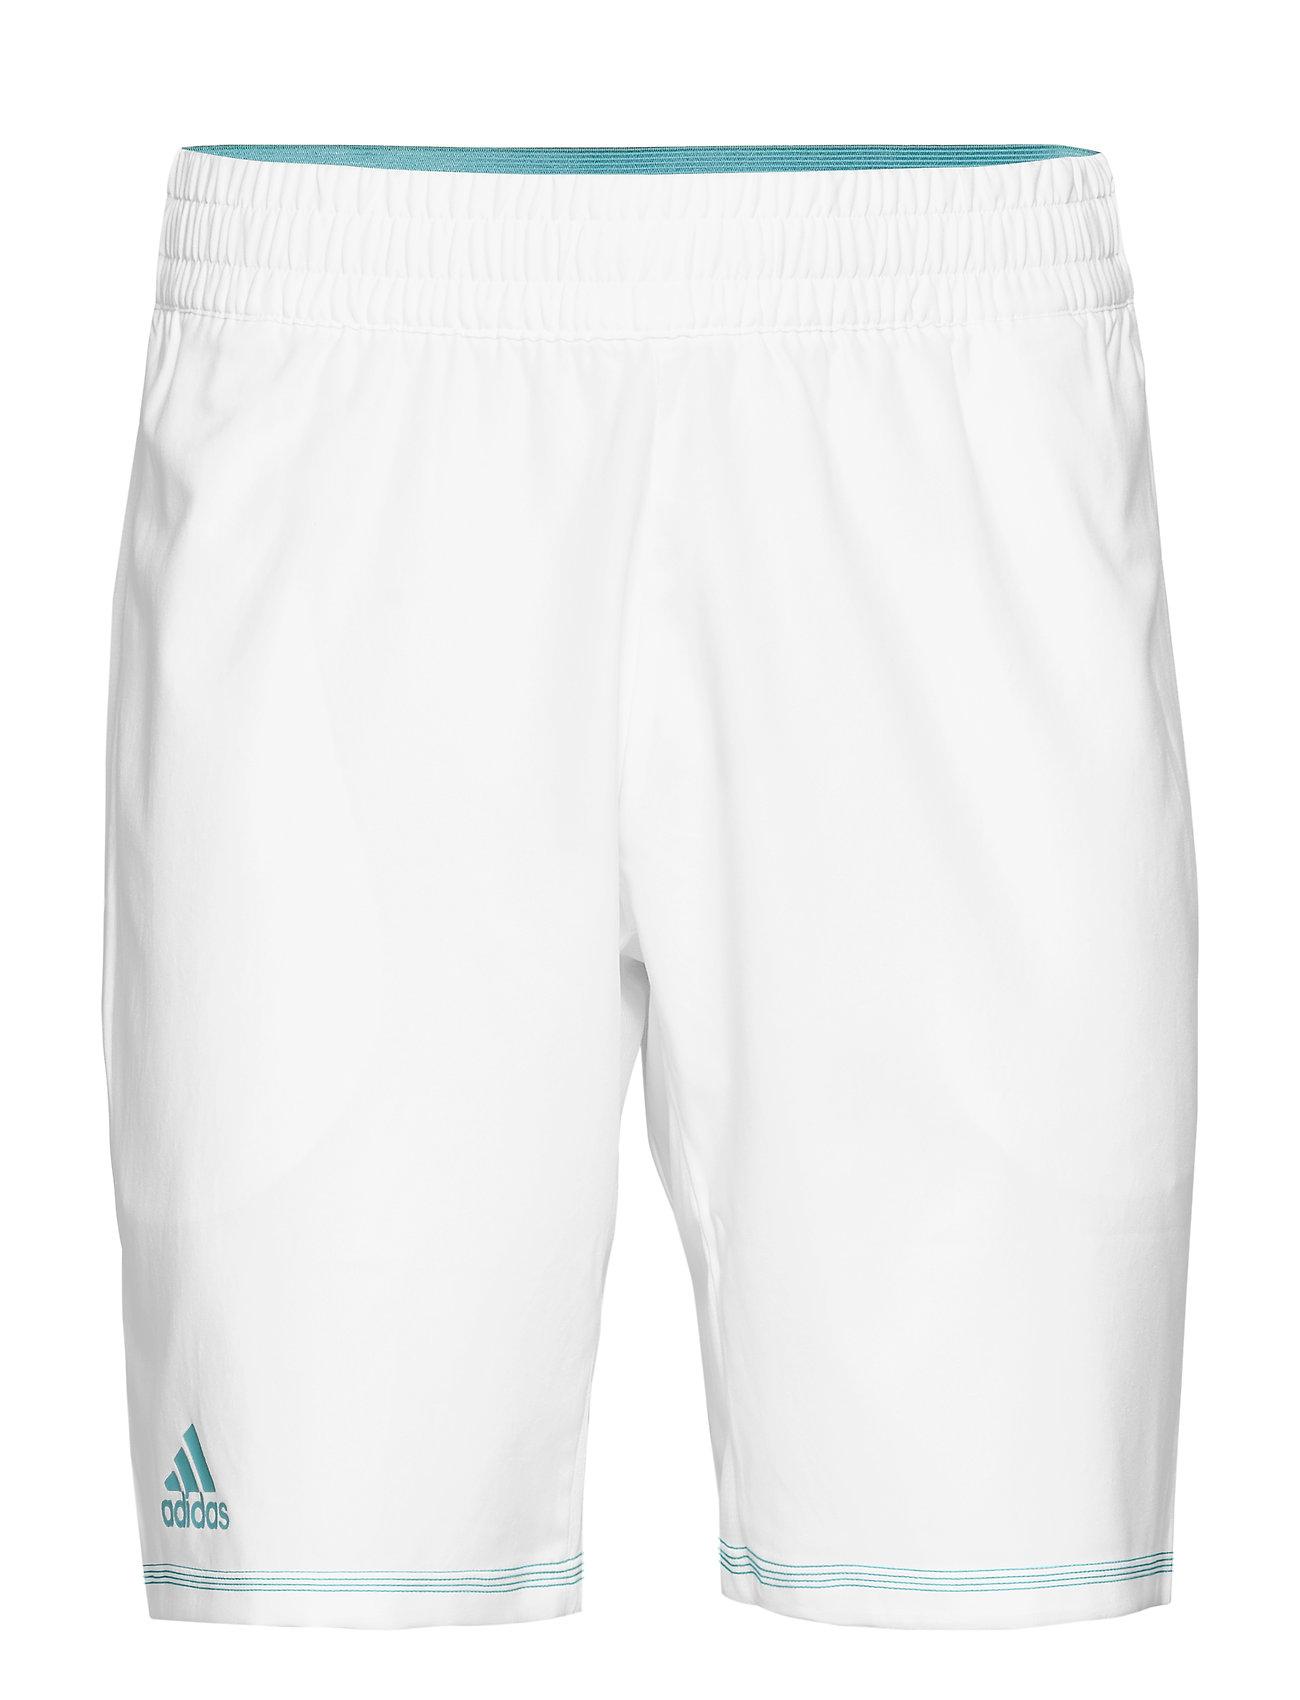 adidas Tennis PARLEY SHORT 9 M - WHITE